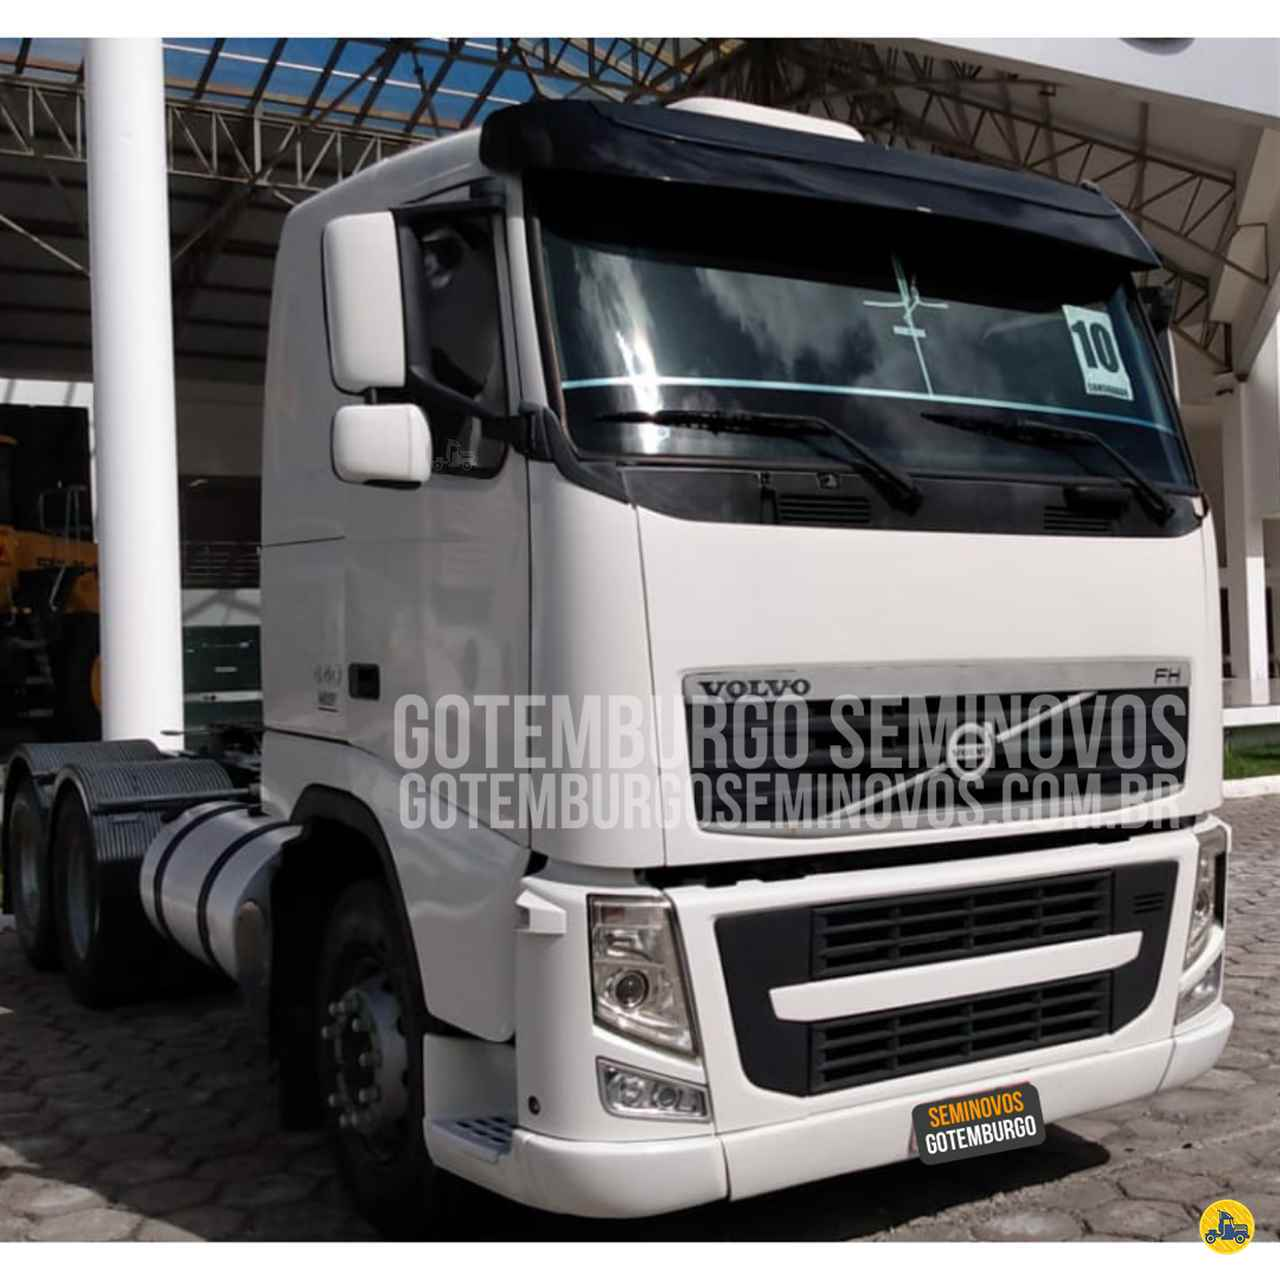 CAMINHAO VOLVO VOLVO FH 440 Cavalo Mecânico Truck 6x2 GOTEMBURGO | SEMINOVOS SIMOES FILHO BAHIA BA